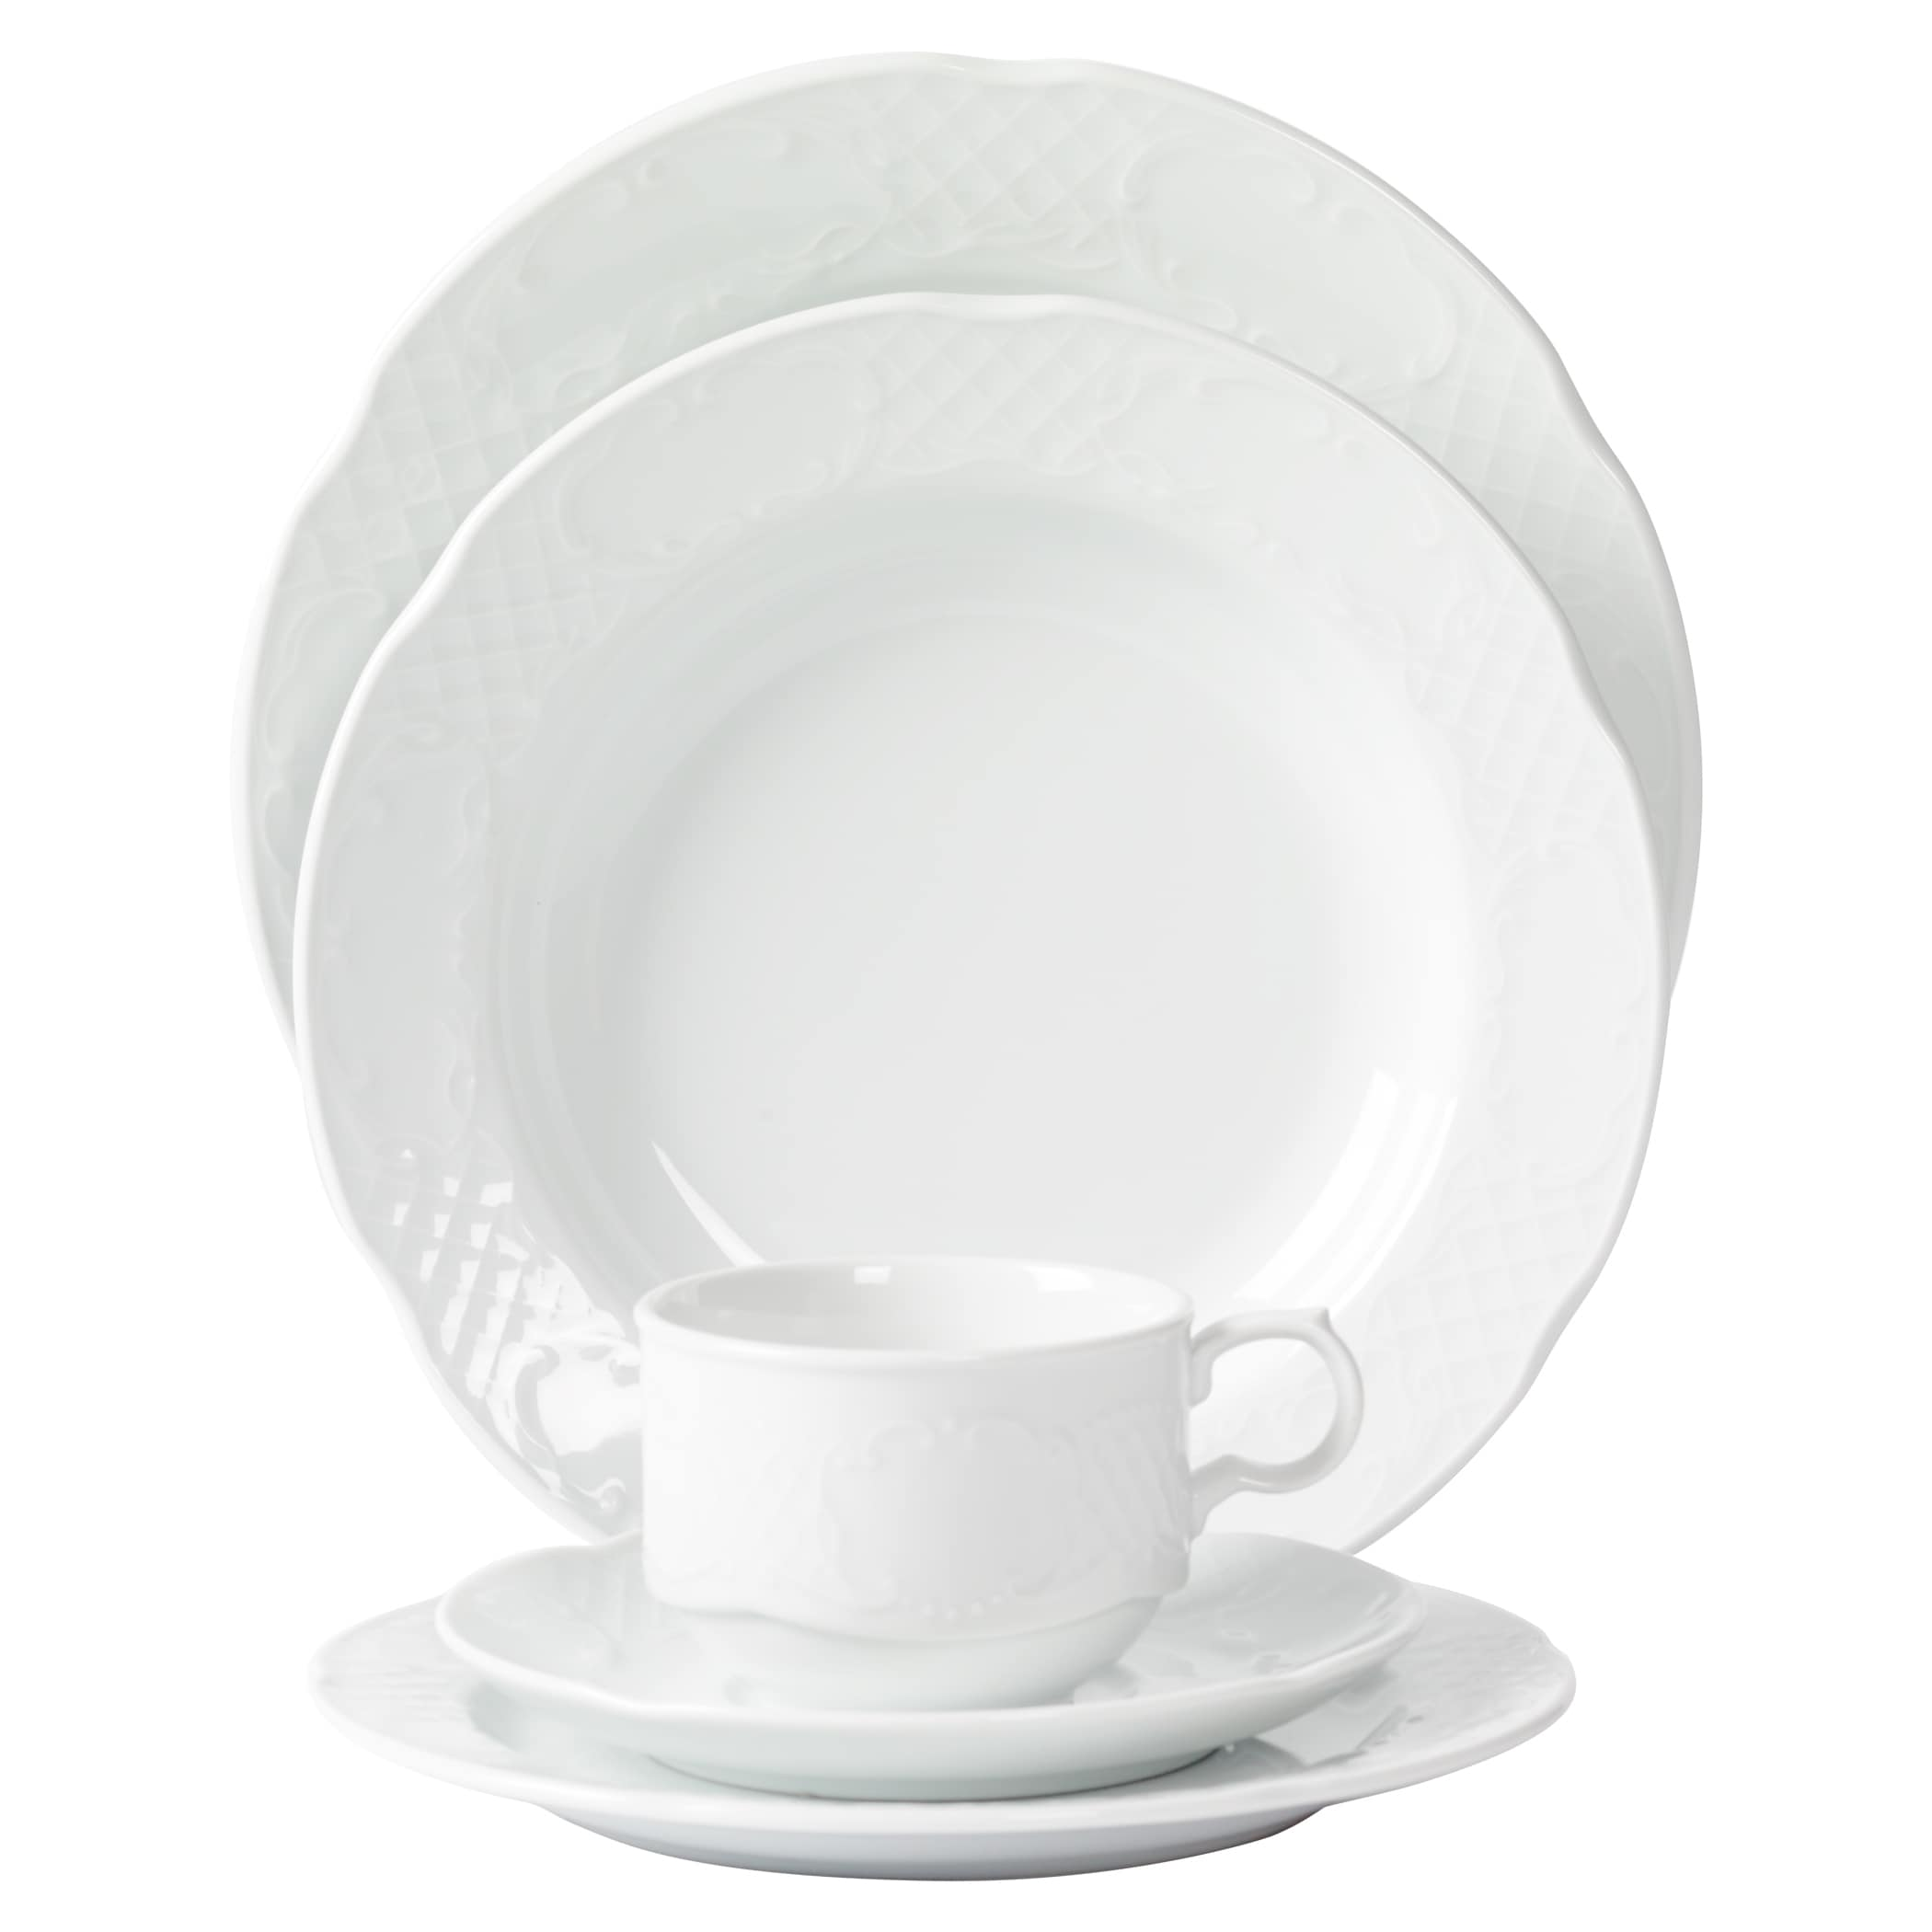 Tabletops Unlimited Inc. Mitterteich Porcelain Flora Scal...